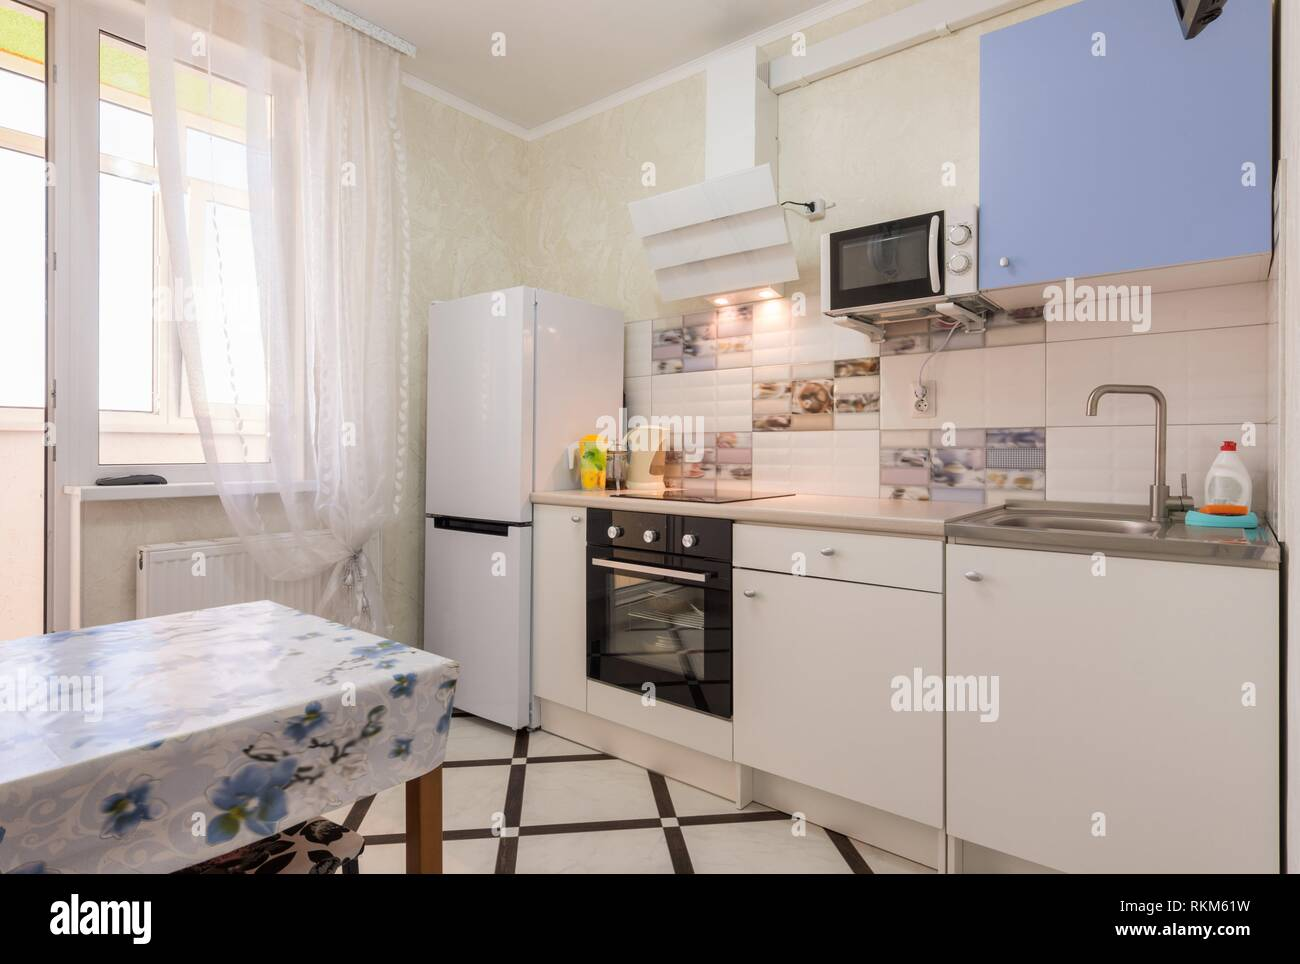 Small Studio Apartment Stock Photos & Small Studio Apartment ...